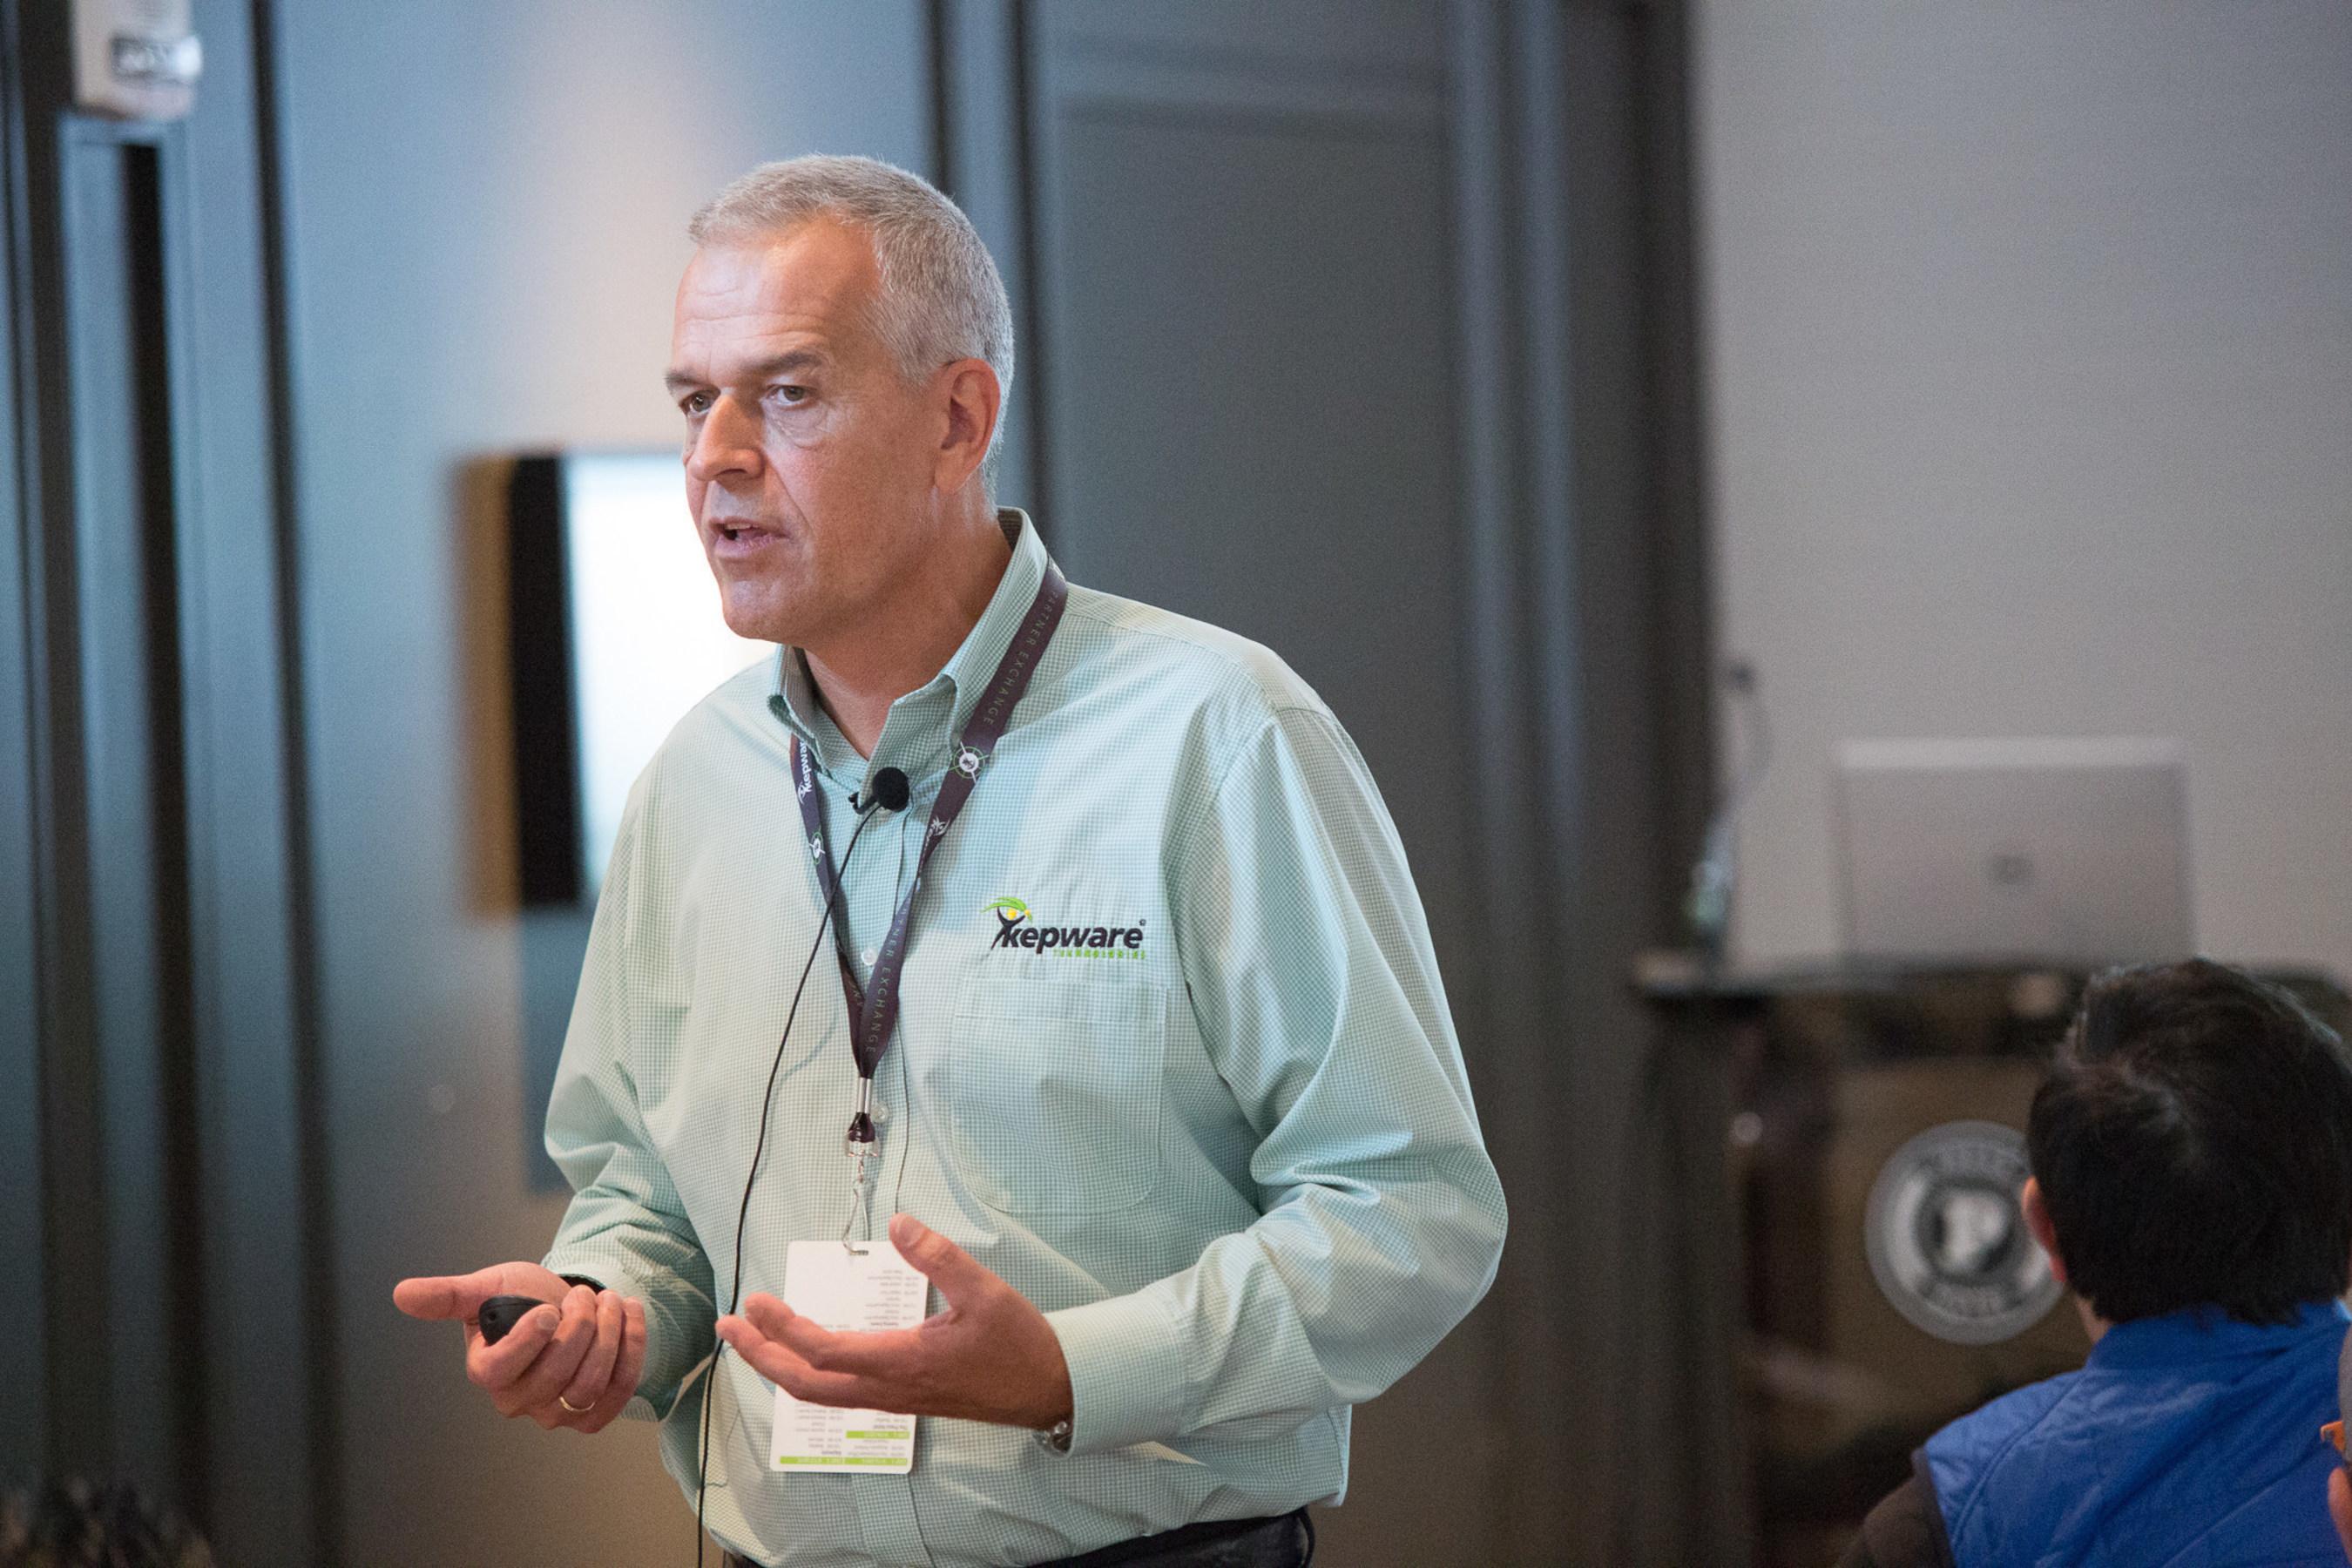 Kepware's Ole Borgbjerg, Managing Director, Europe